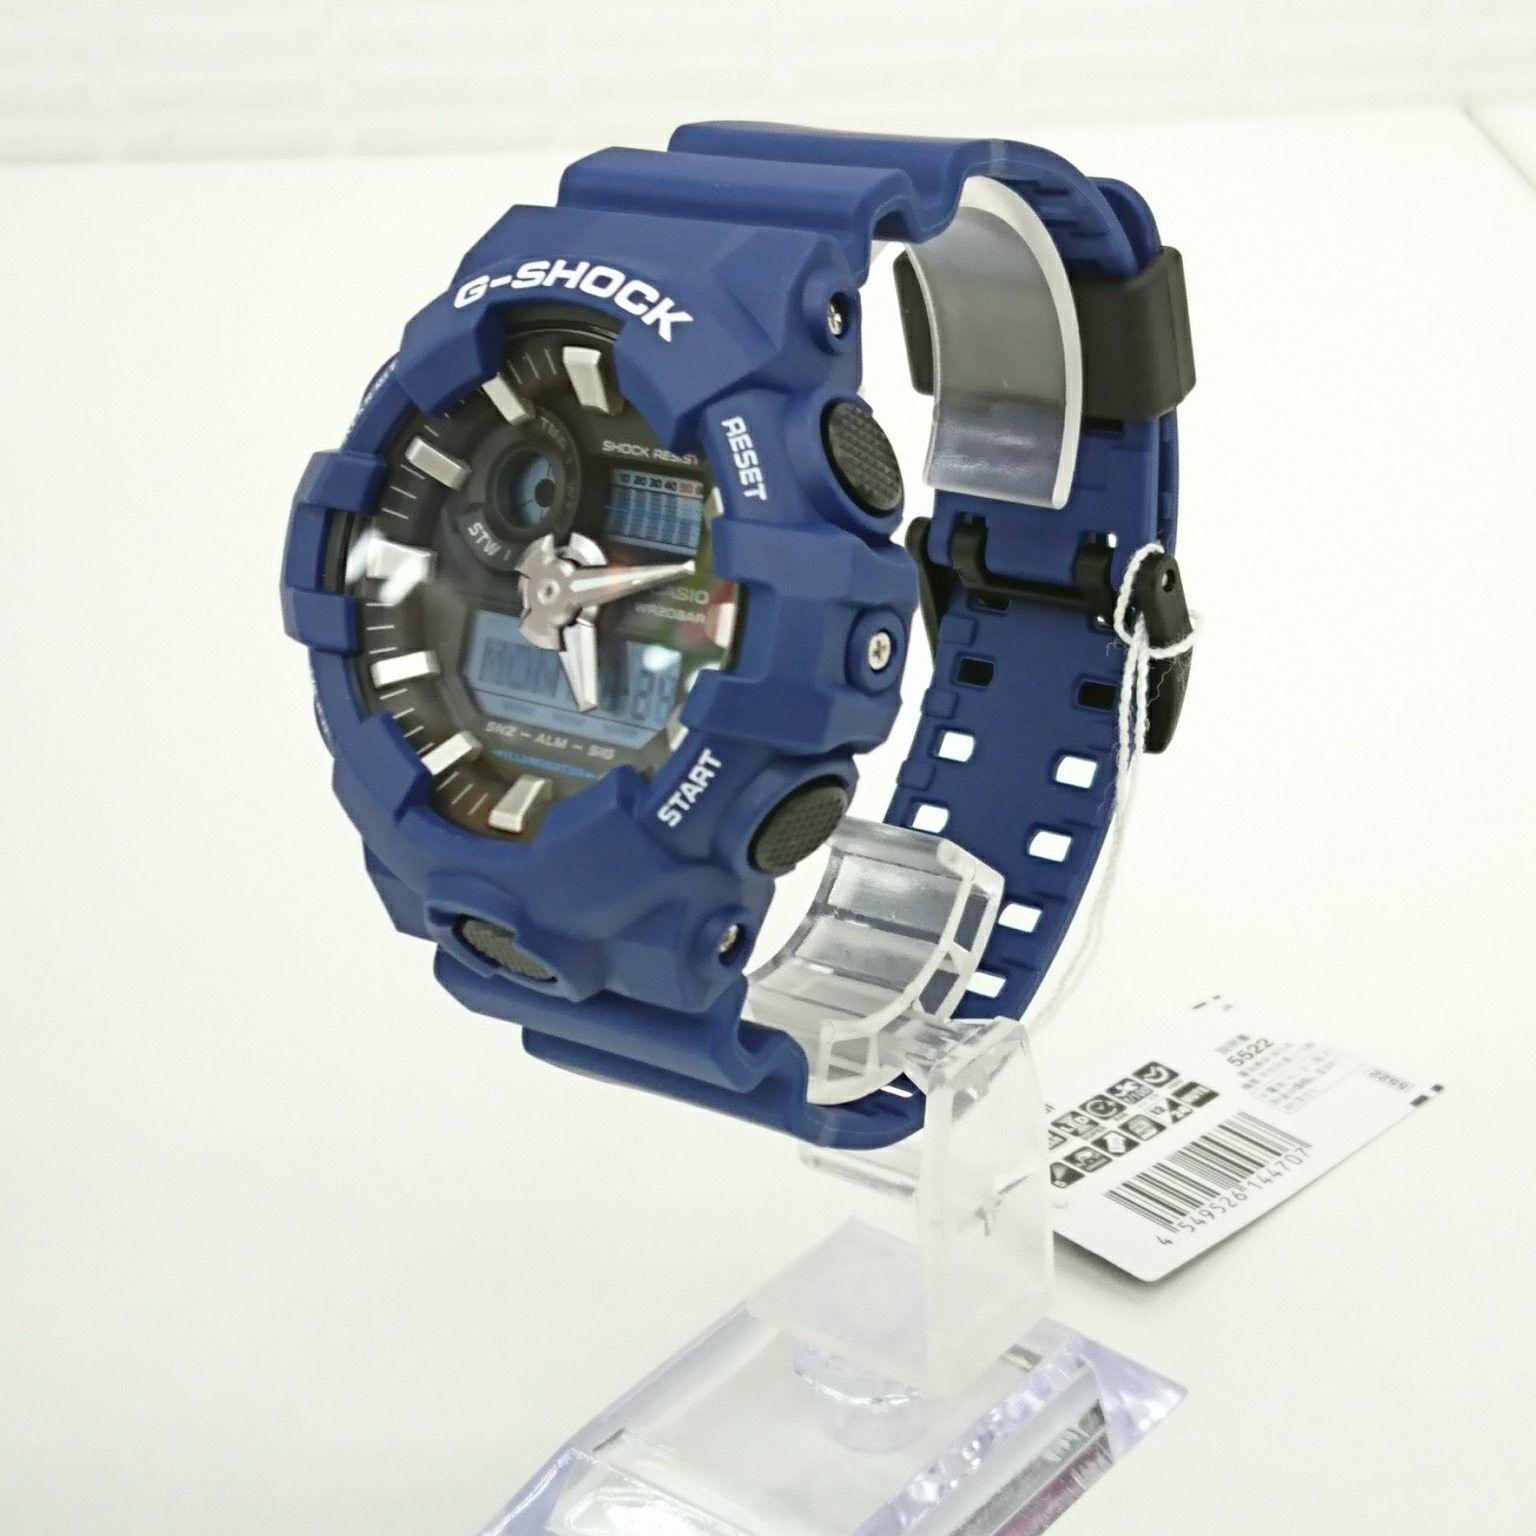 【新品】CASIO G-SHOCK GA-700-2AJF(Wa35)